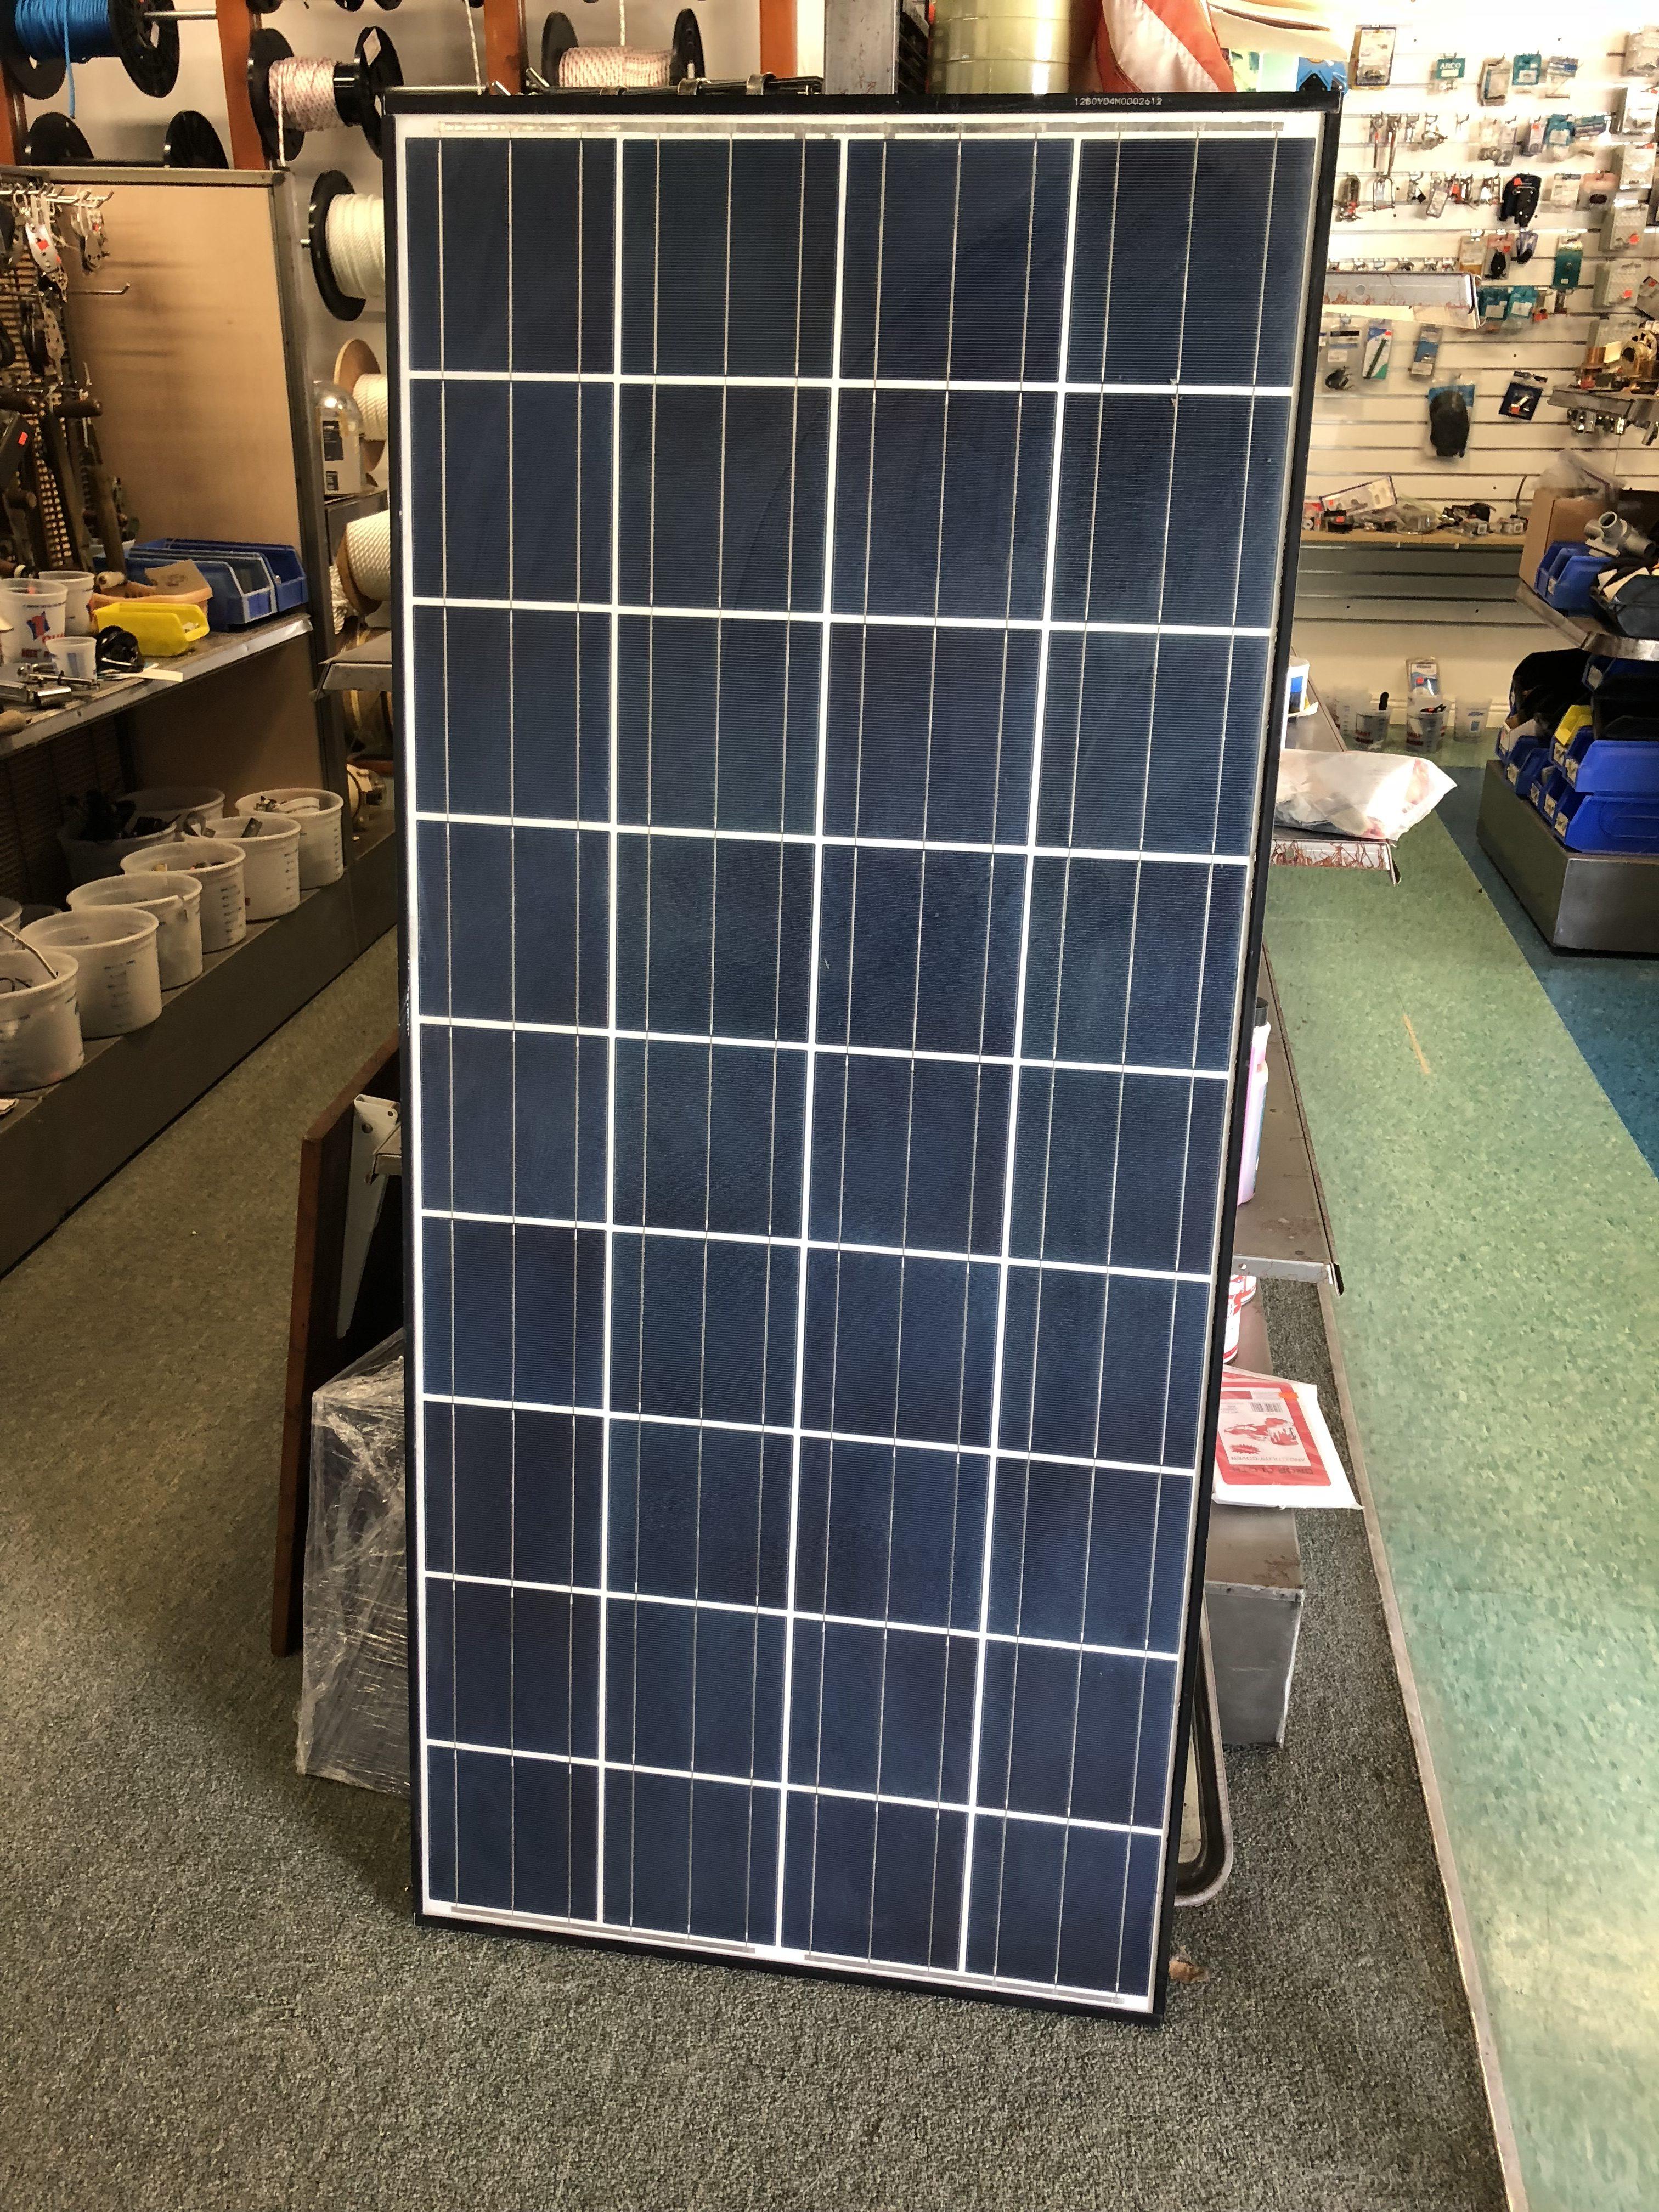 Kyocera Kd140sx Ufbs 140w Solar Panel